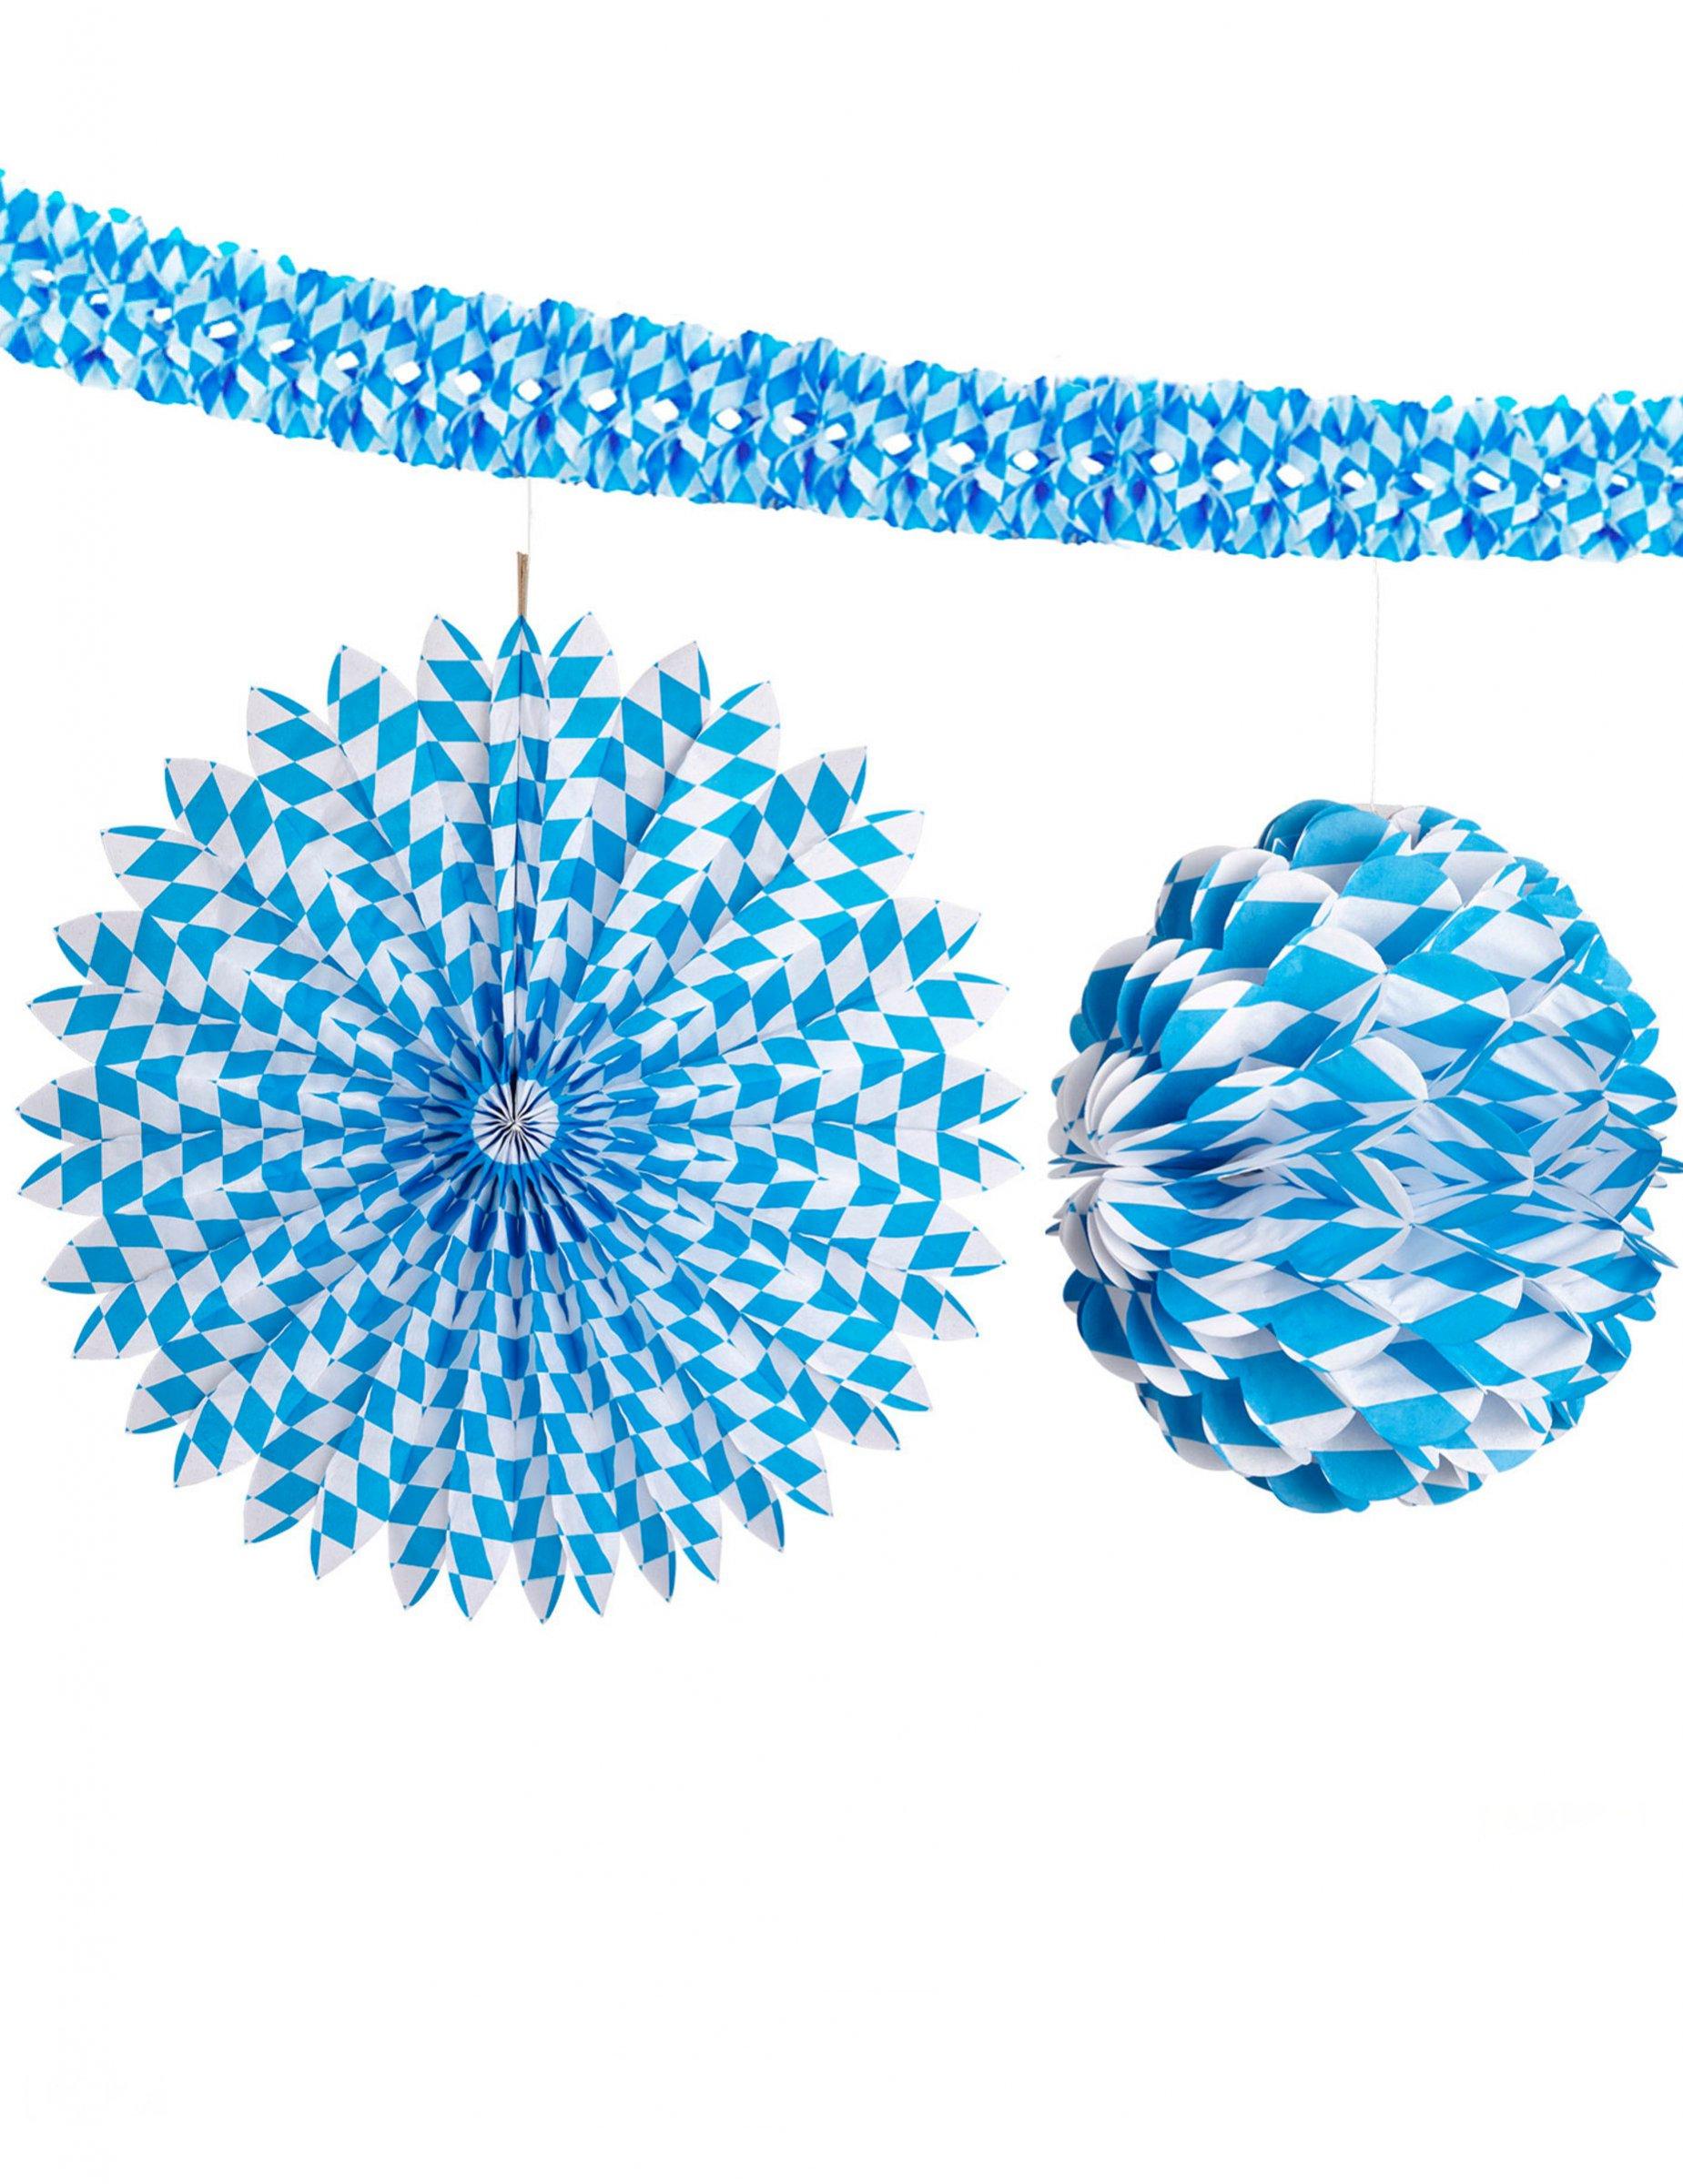 oktoberfest girlanden deko set 3 teilig weiss blau g nstige faschings partydeko zubeh r bei. Black Bedroom Furniture Sets. Home Design Ideas